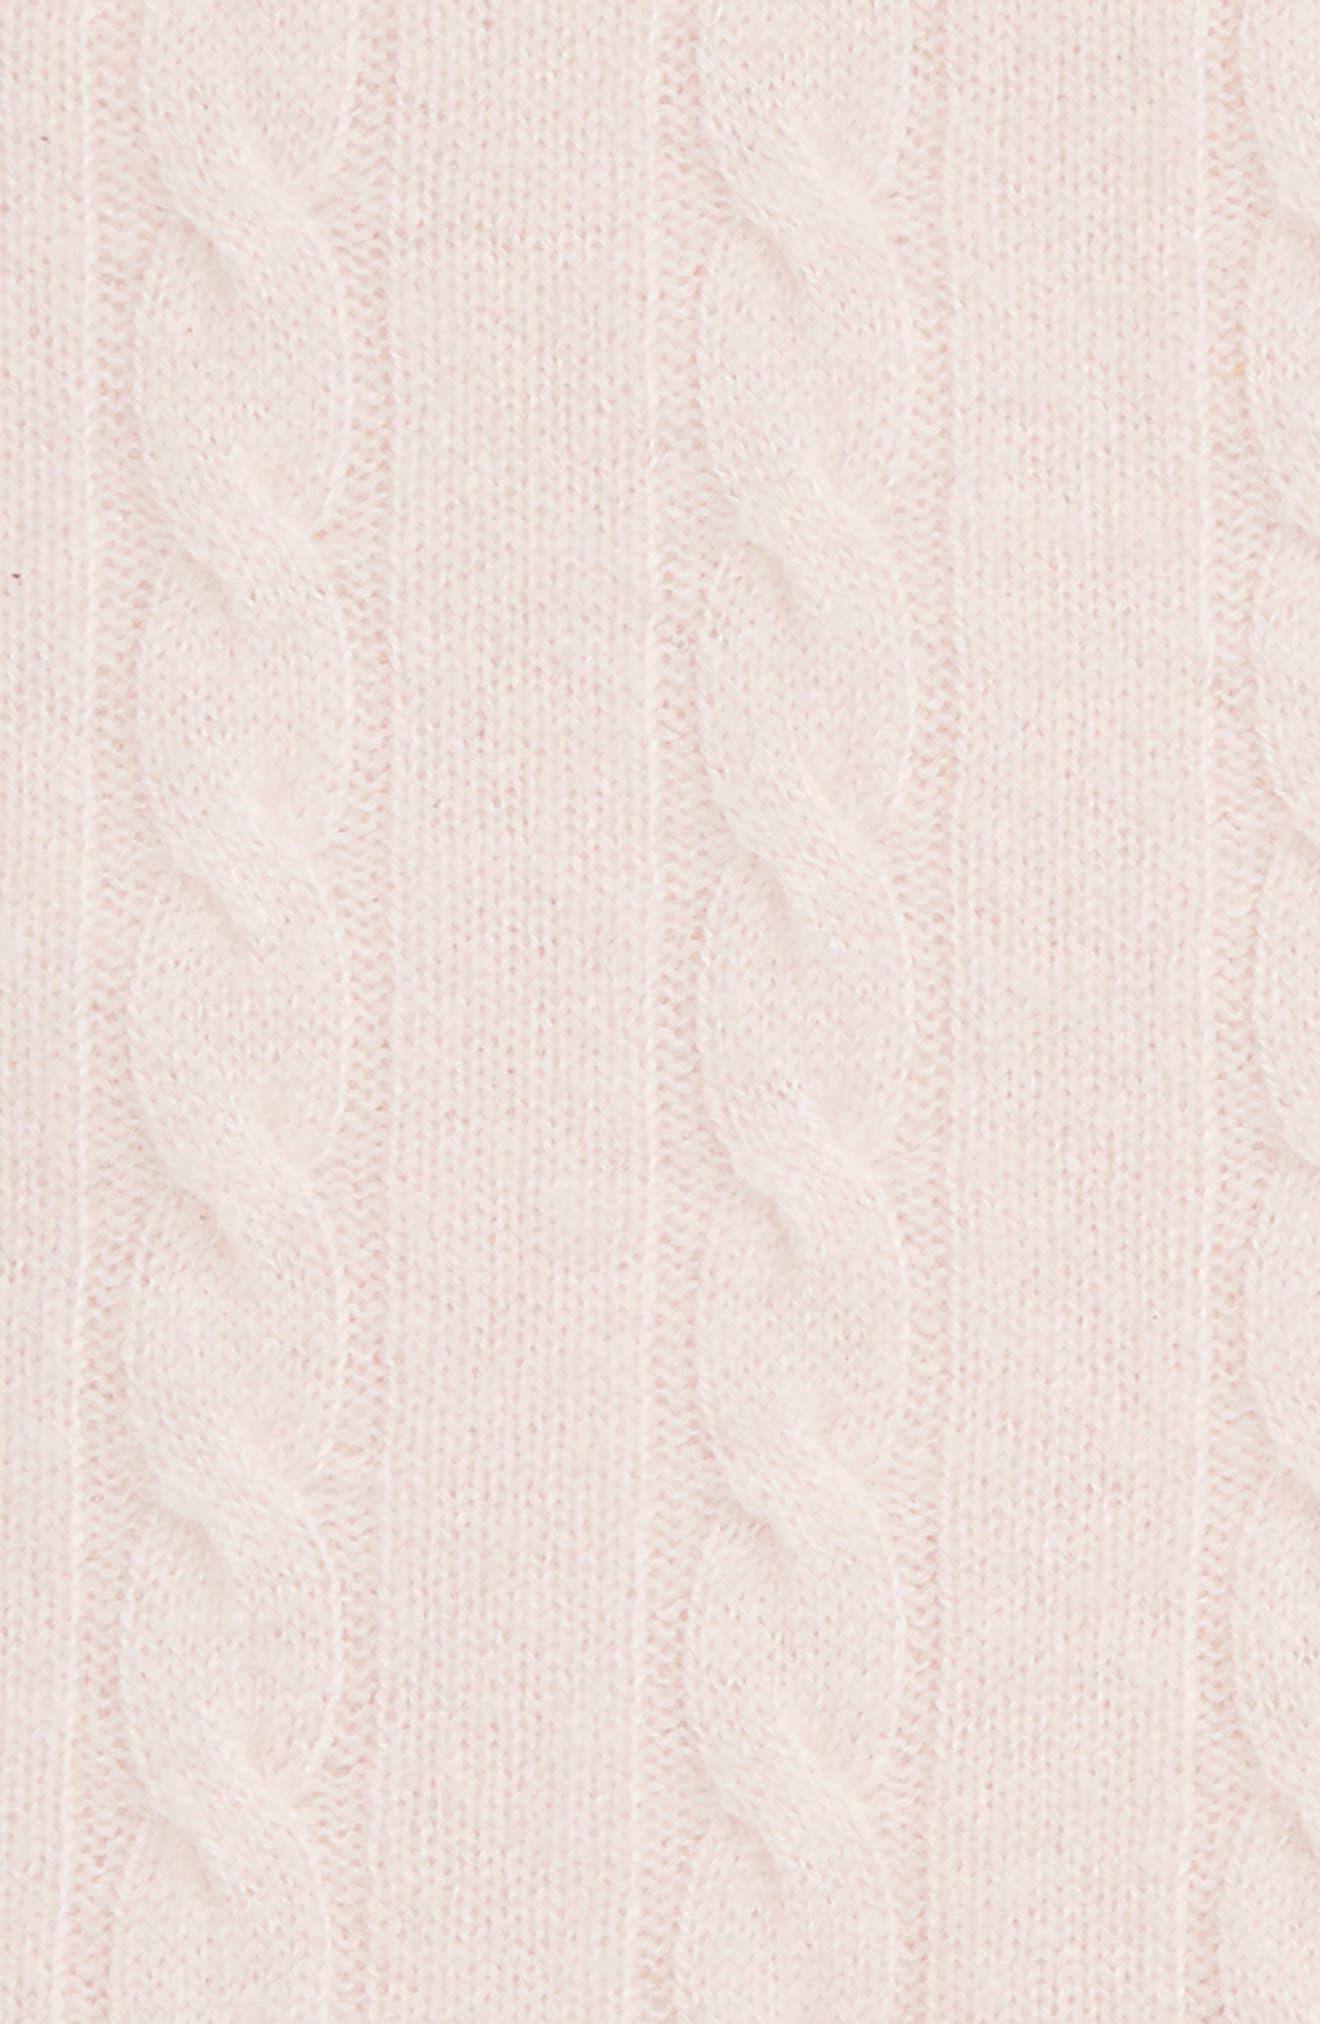 Cashmere Cable Knit Blanket,                             Alternate thumbnail 2, color,                             PINK DREAM